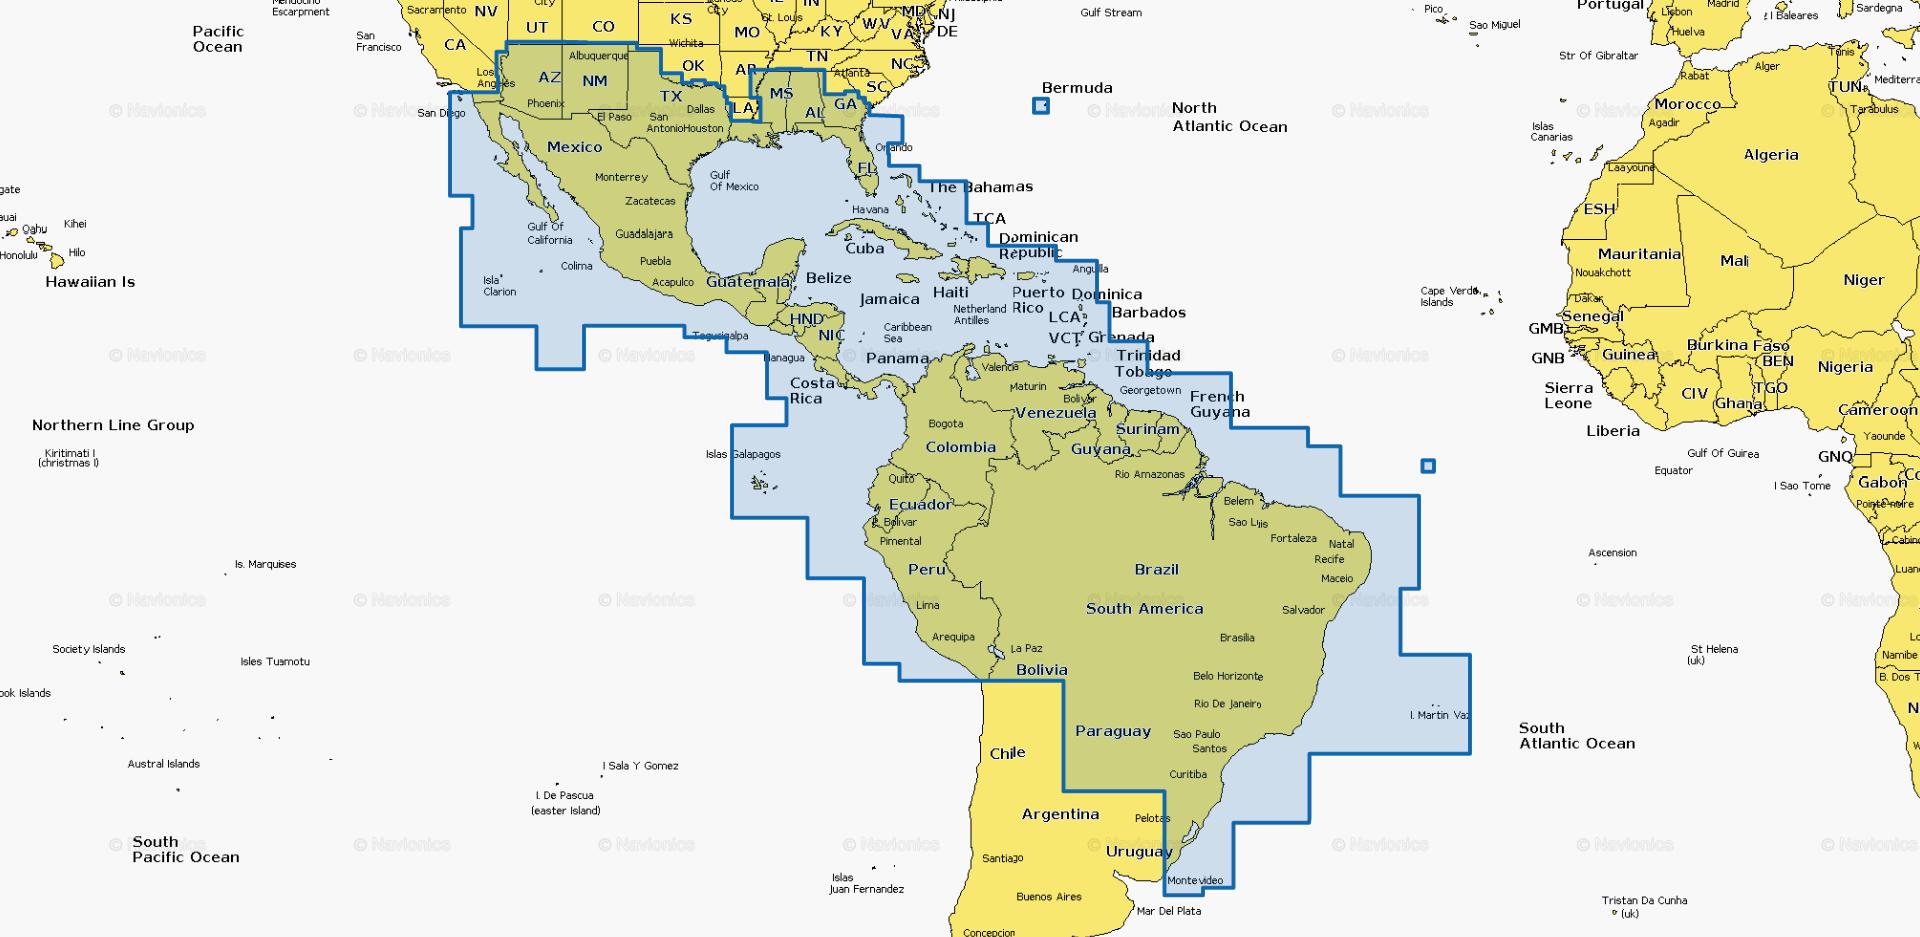 navionics +4XG mexico,caribbean,Brazil MSD kort